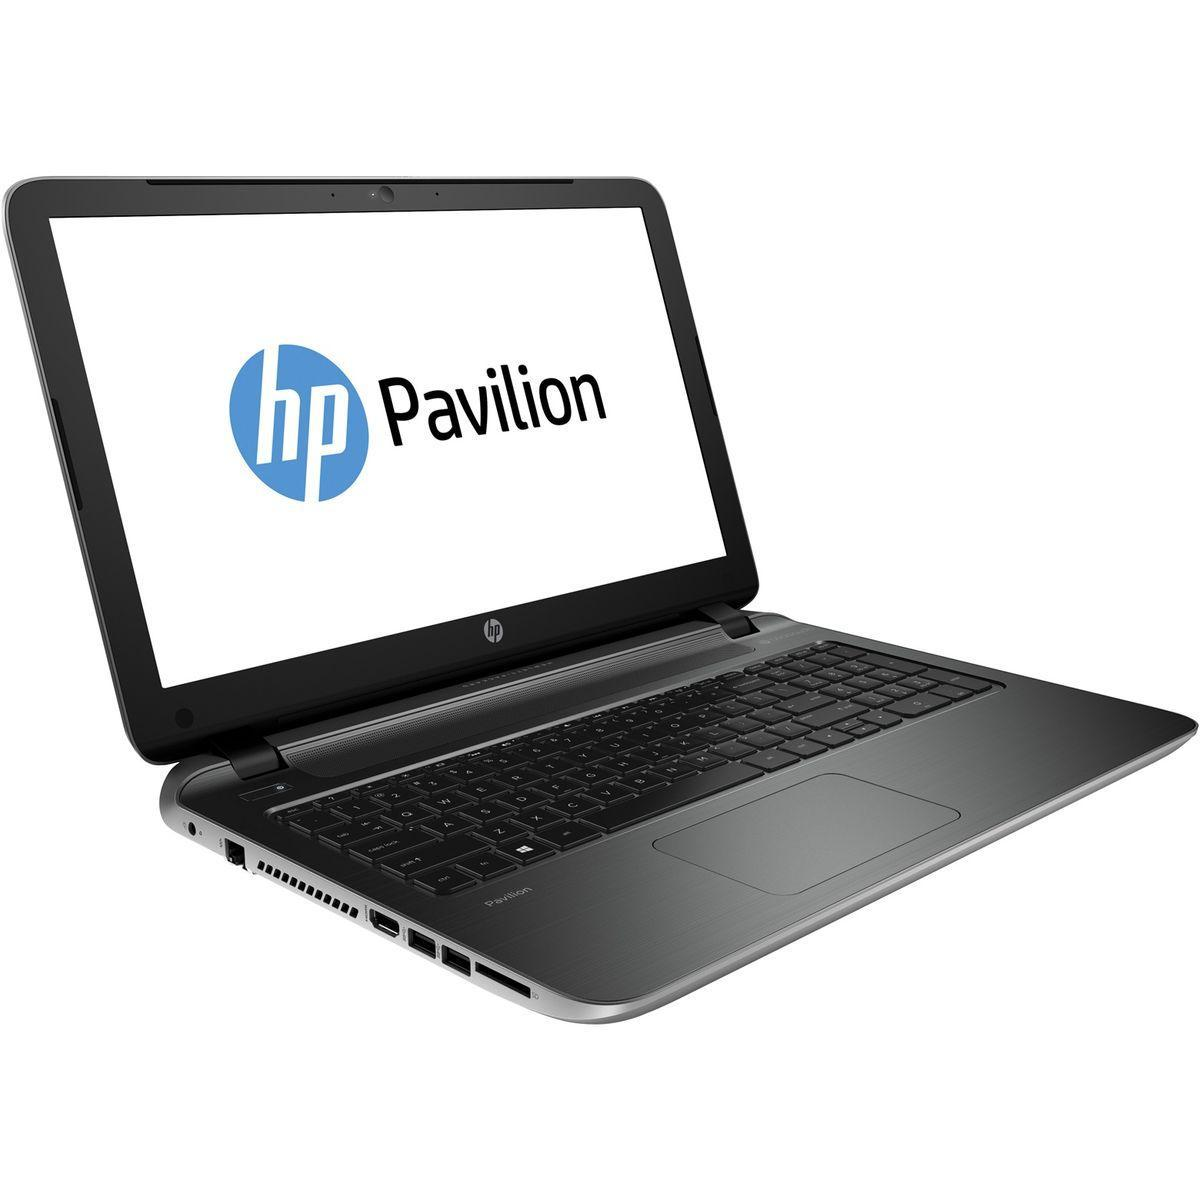 Hewlett Packard PAVILION 15-P269NF - I5-5200U 2,2 Ghz GHz - HDD 750  Go - RAM 4096 Mo Go - AZERTY